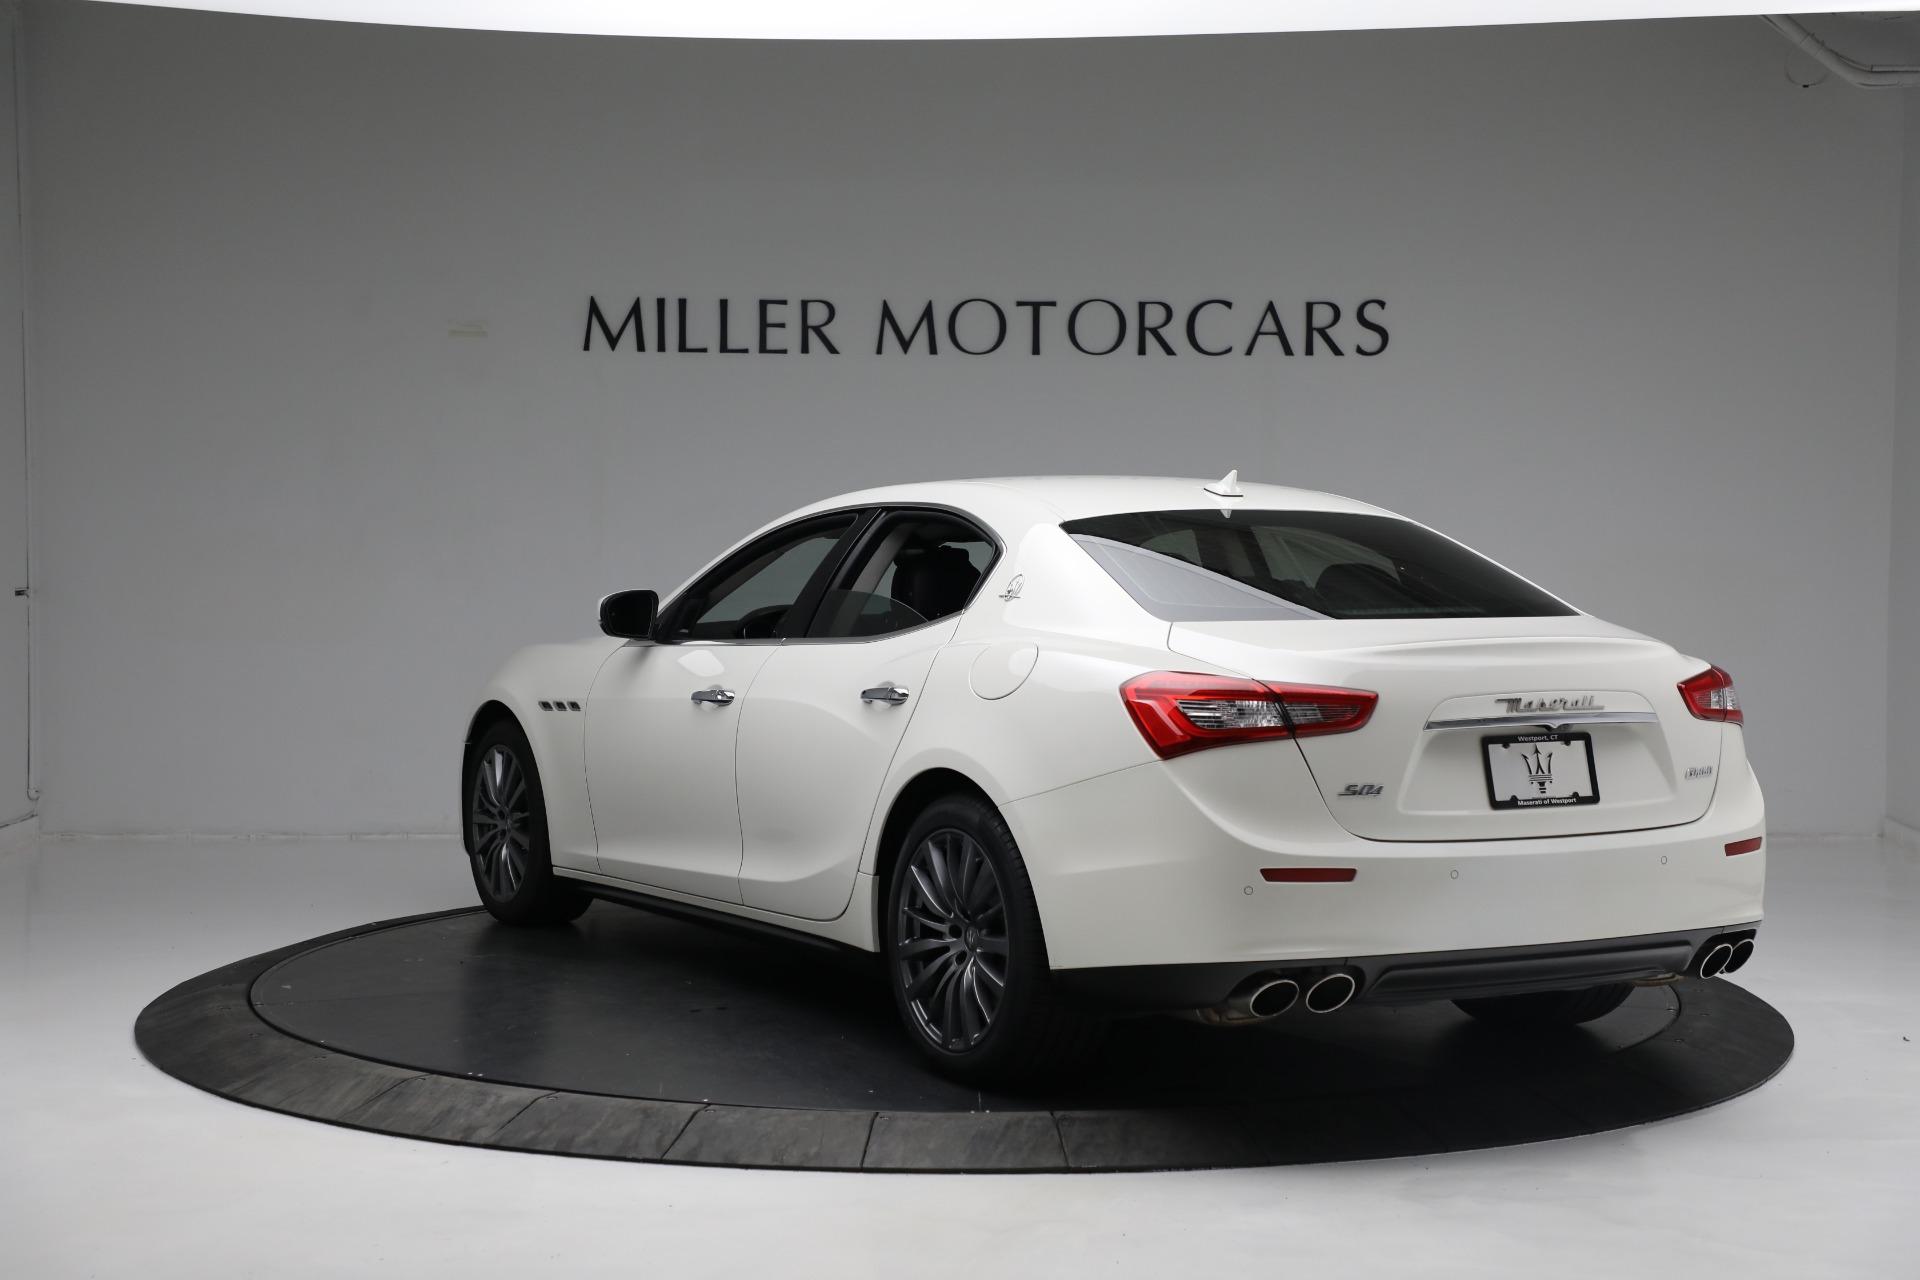 New 2017 Maserati Ghibli S Q4 EX-Loaner For Sale In Greenwich, CT 1019_p5